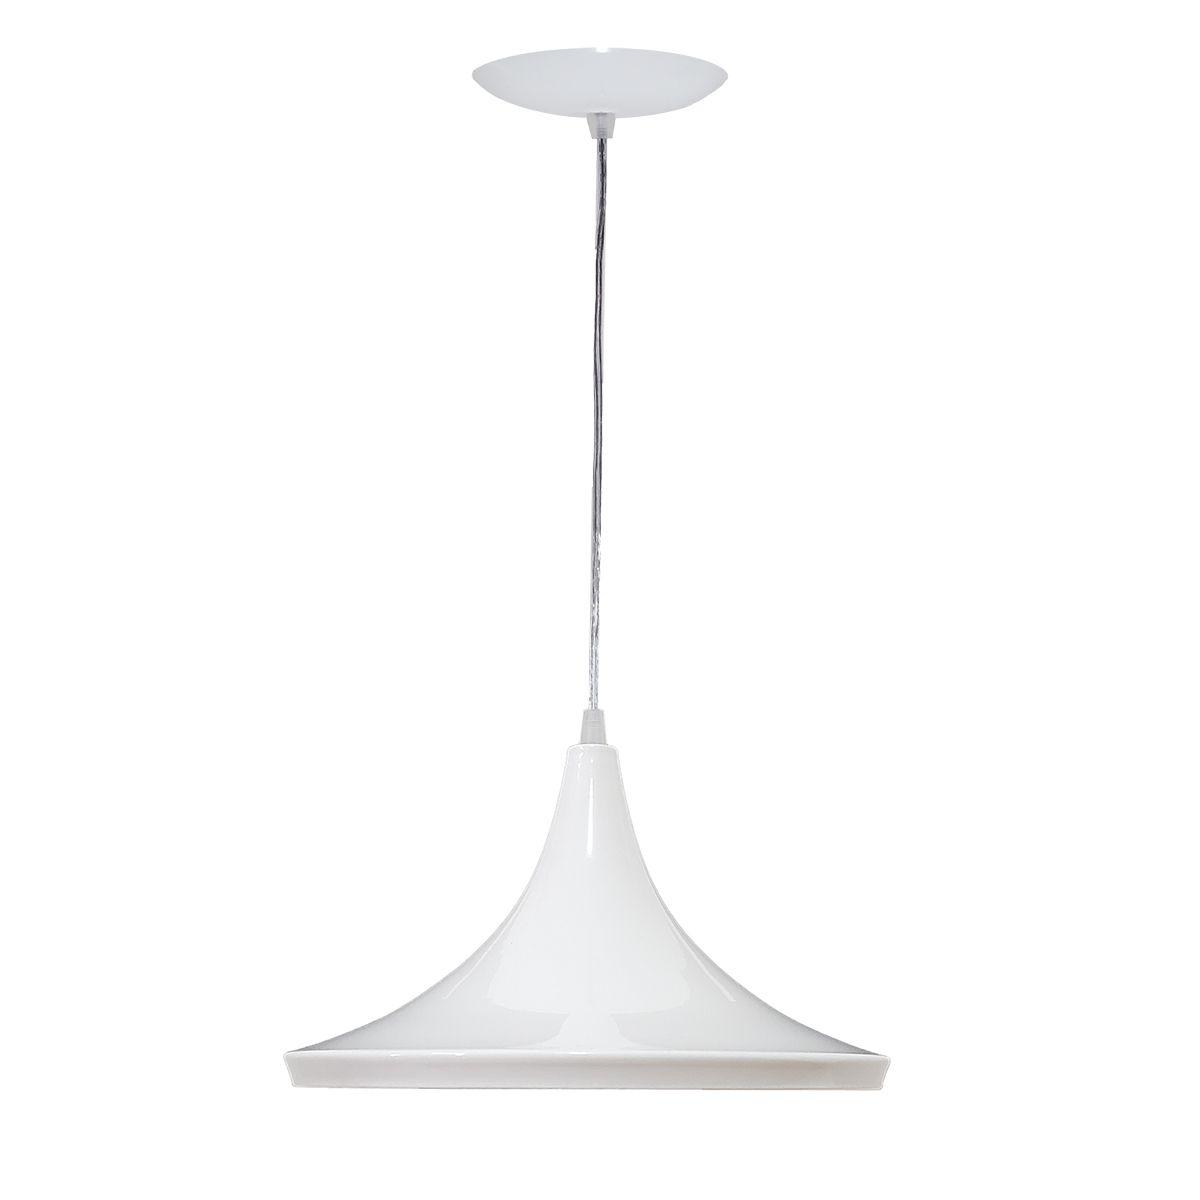 Luminária Decorativa Chapéu Chinês 34 Branco/Cobre Pendente